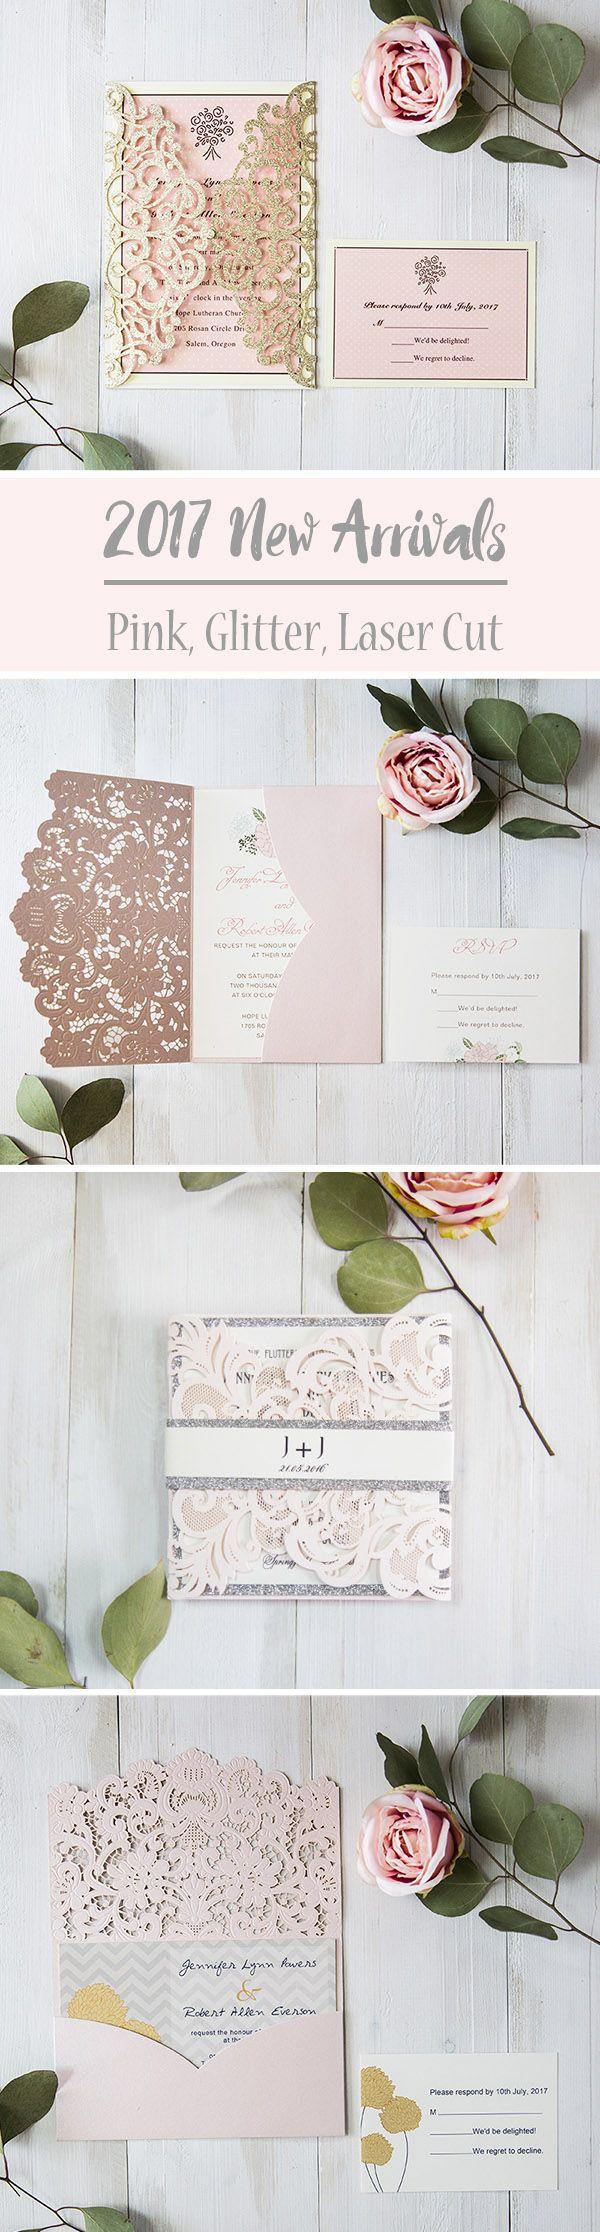 romantic and elegant pink laser cut wedding invitations#weddinginvitations  #pinkwedding #ElegantWeddingInvites